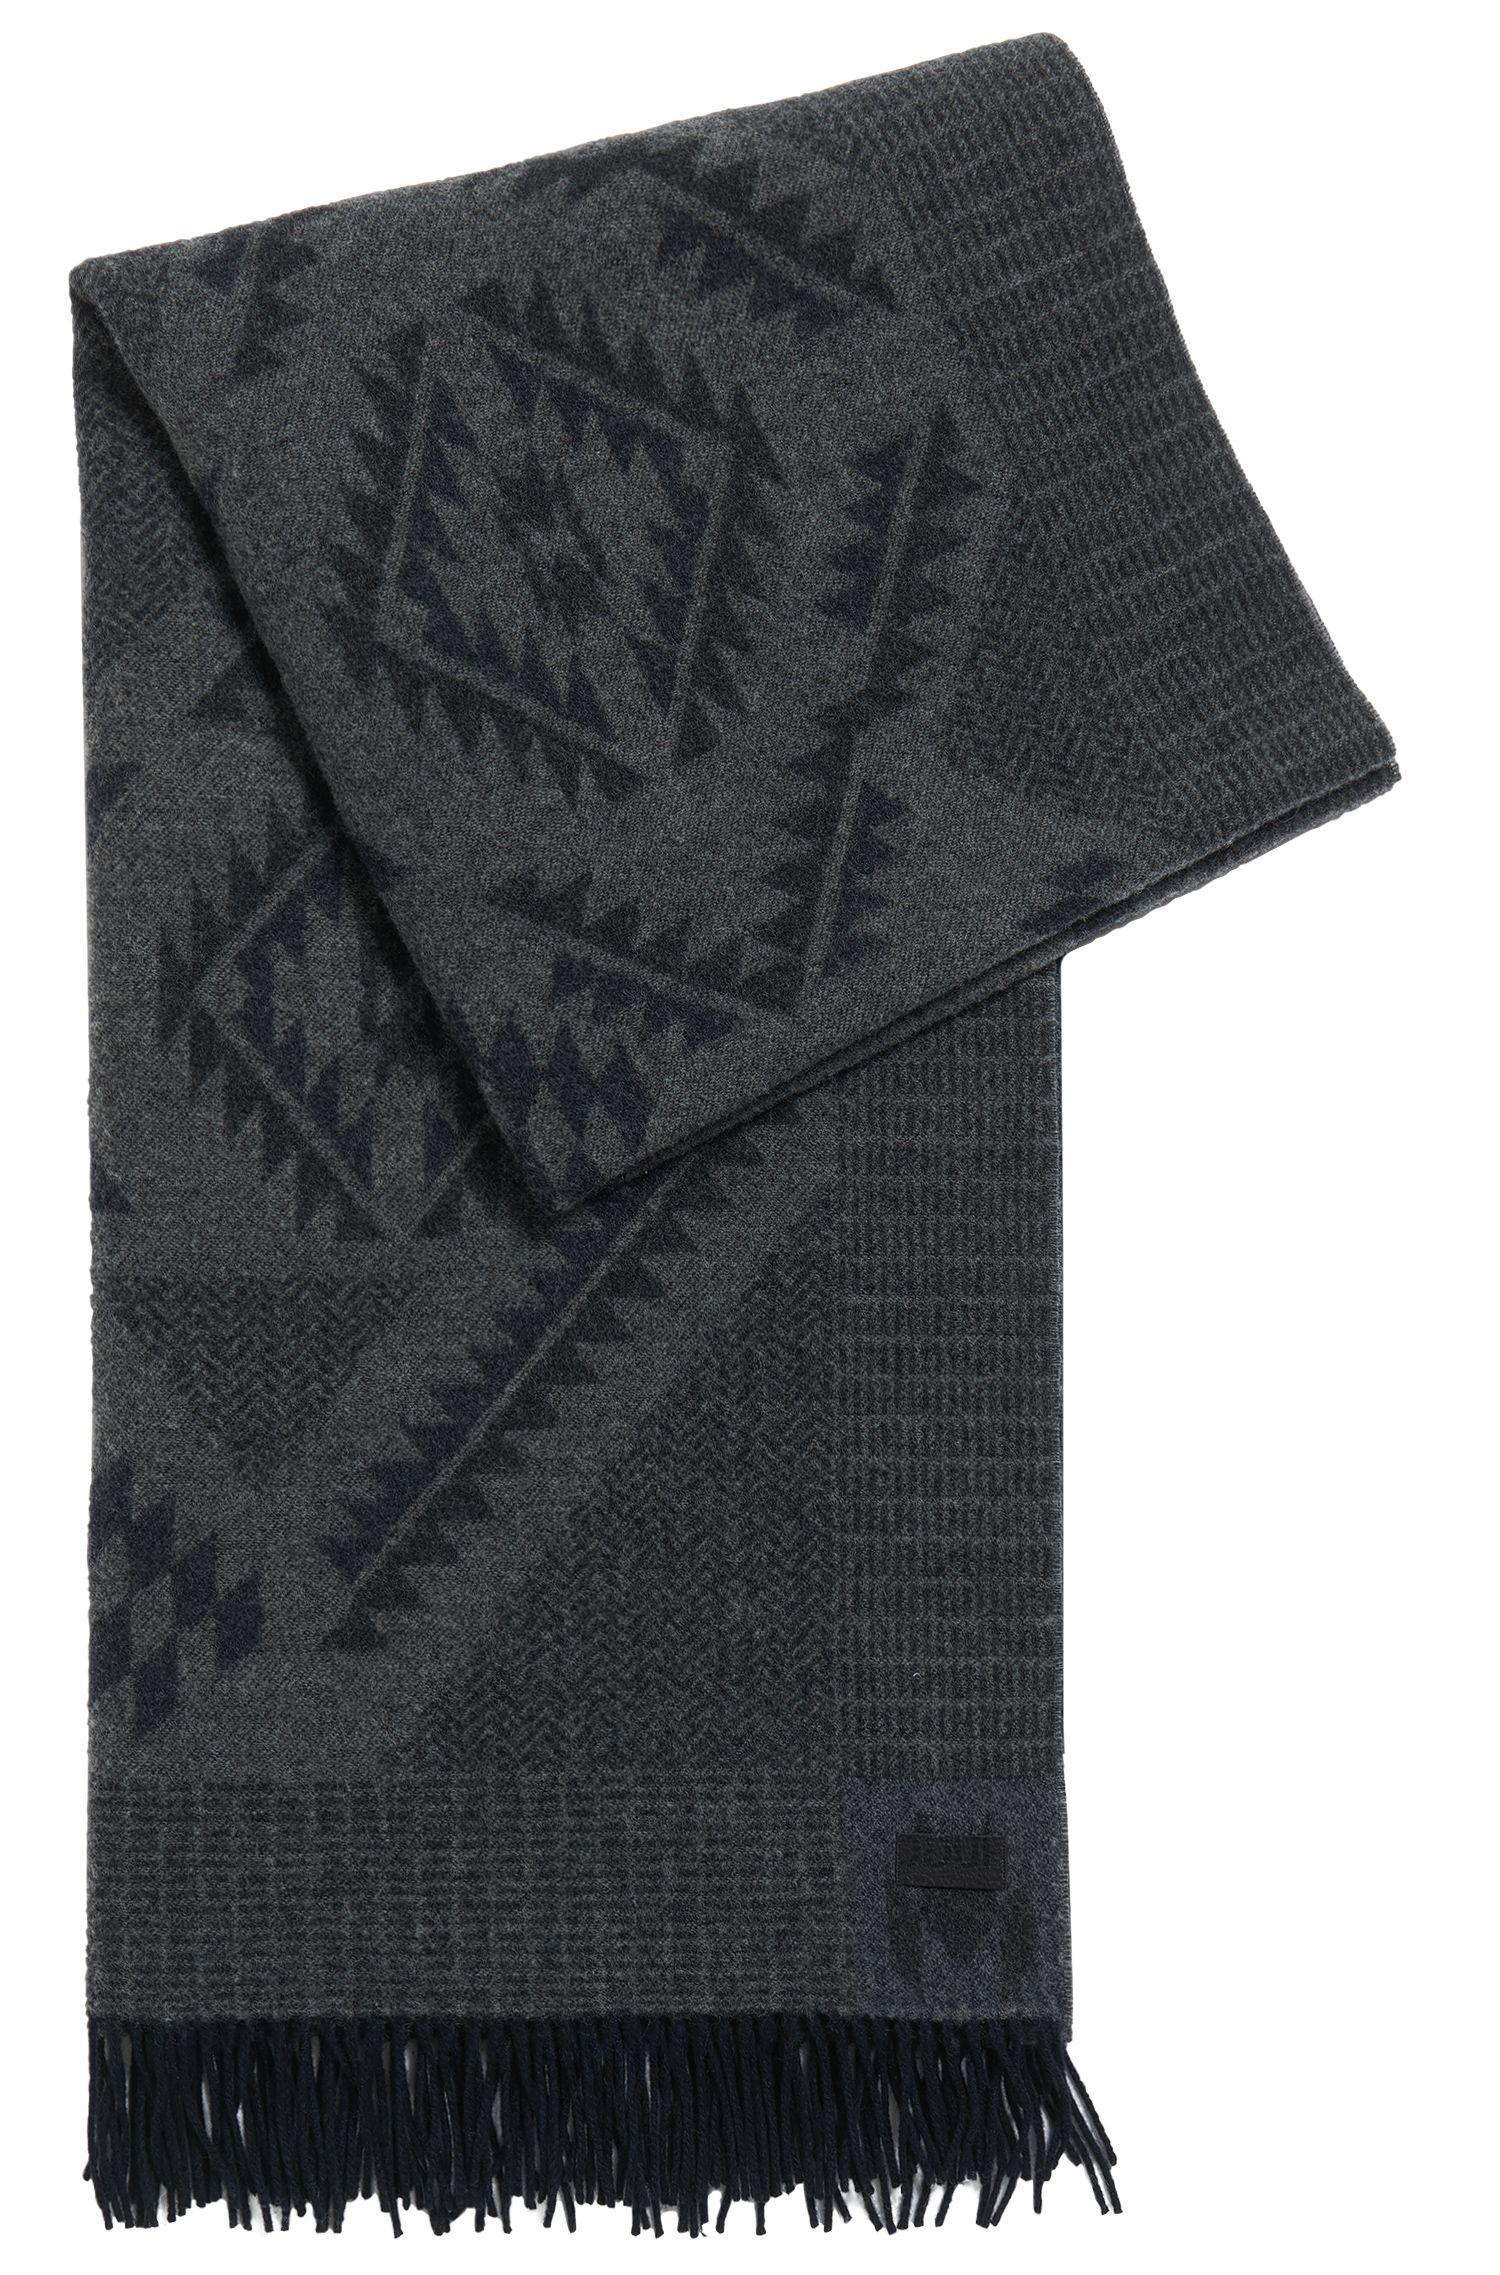 Sjaal van jacquardwol met Aztekendessin